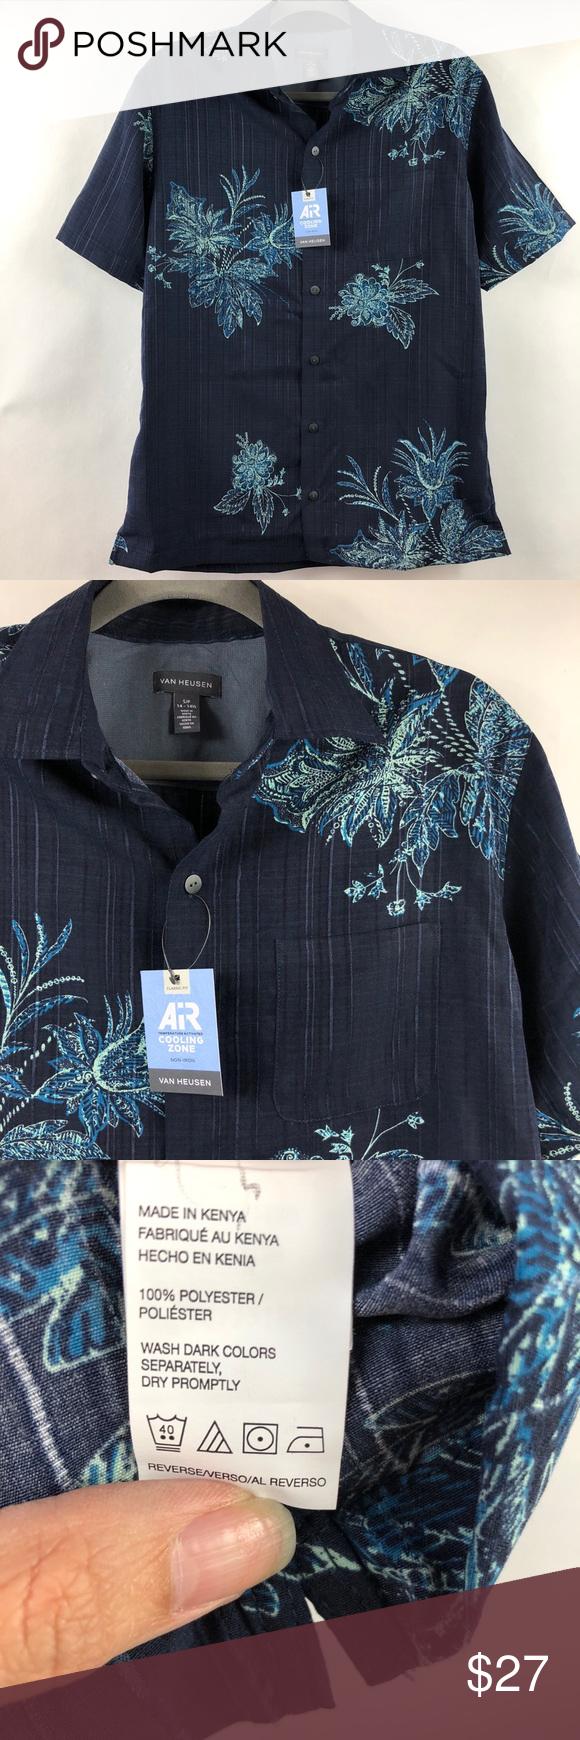 Van Heusen Air Cooling Non Iron Casual Dress Shirt Nwt With Images Shirt Dress Casual Shirt Dress Casual Button Down Shirts